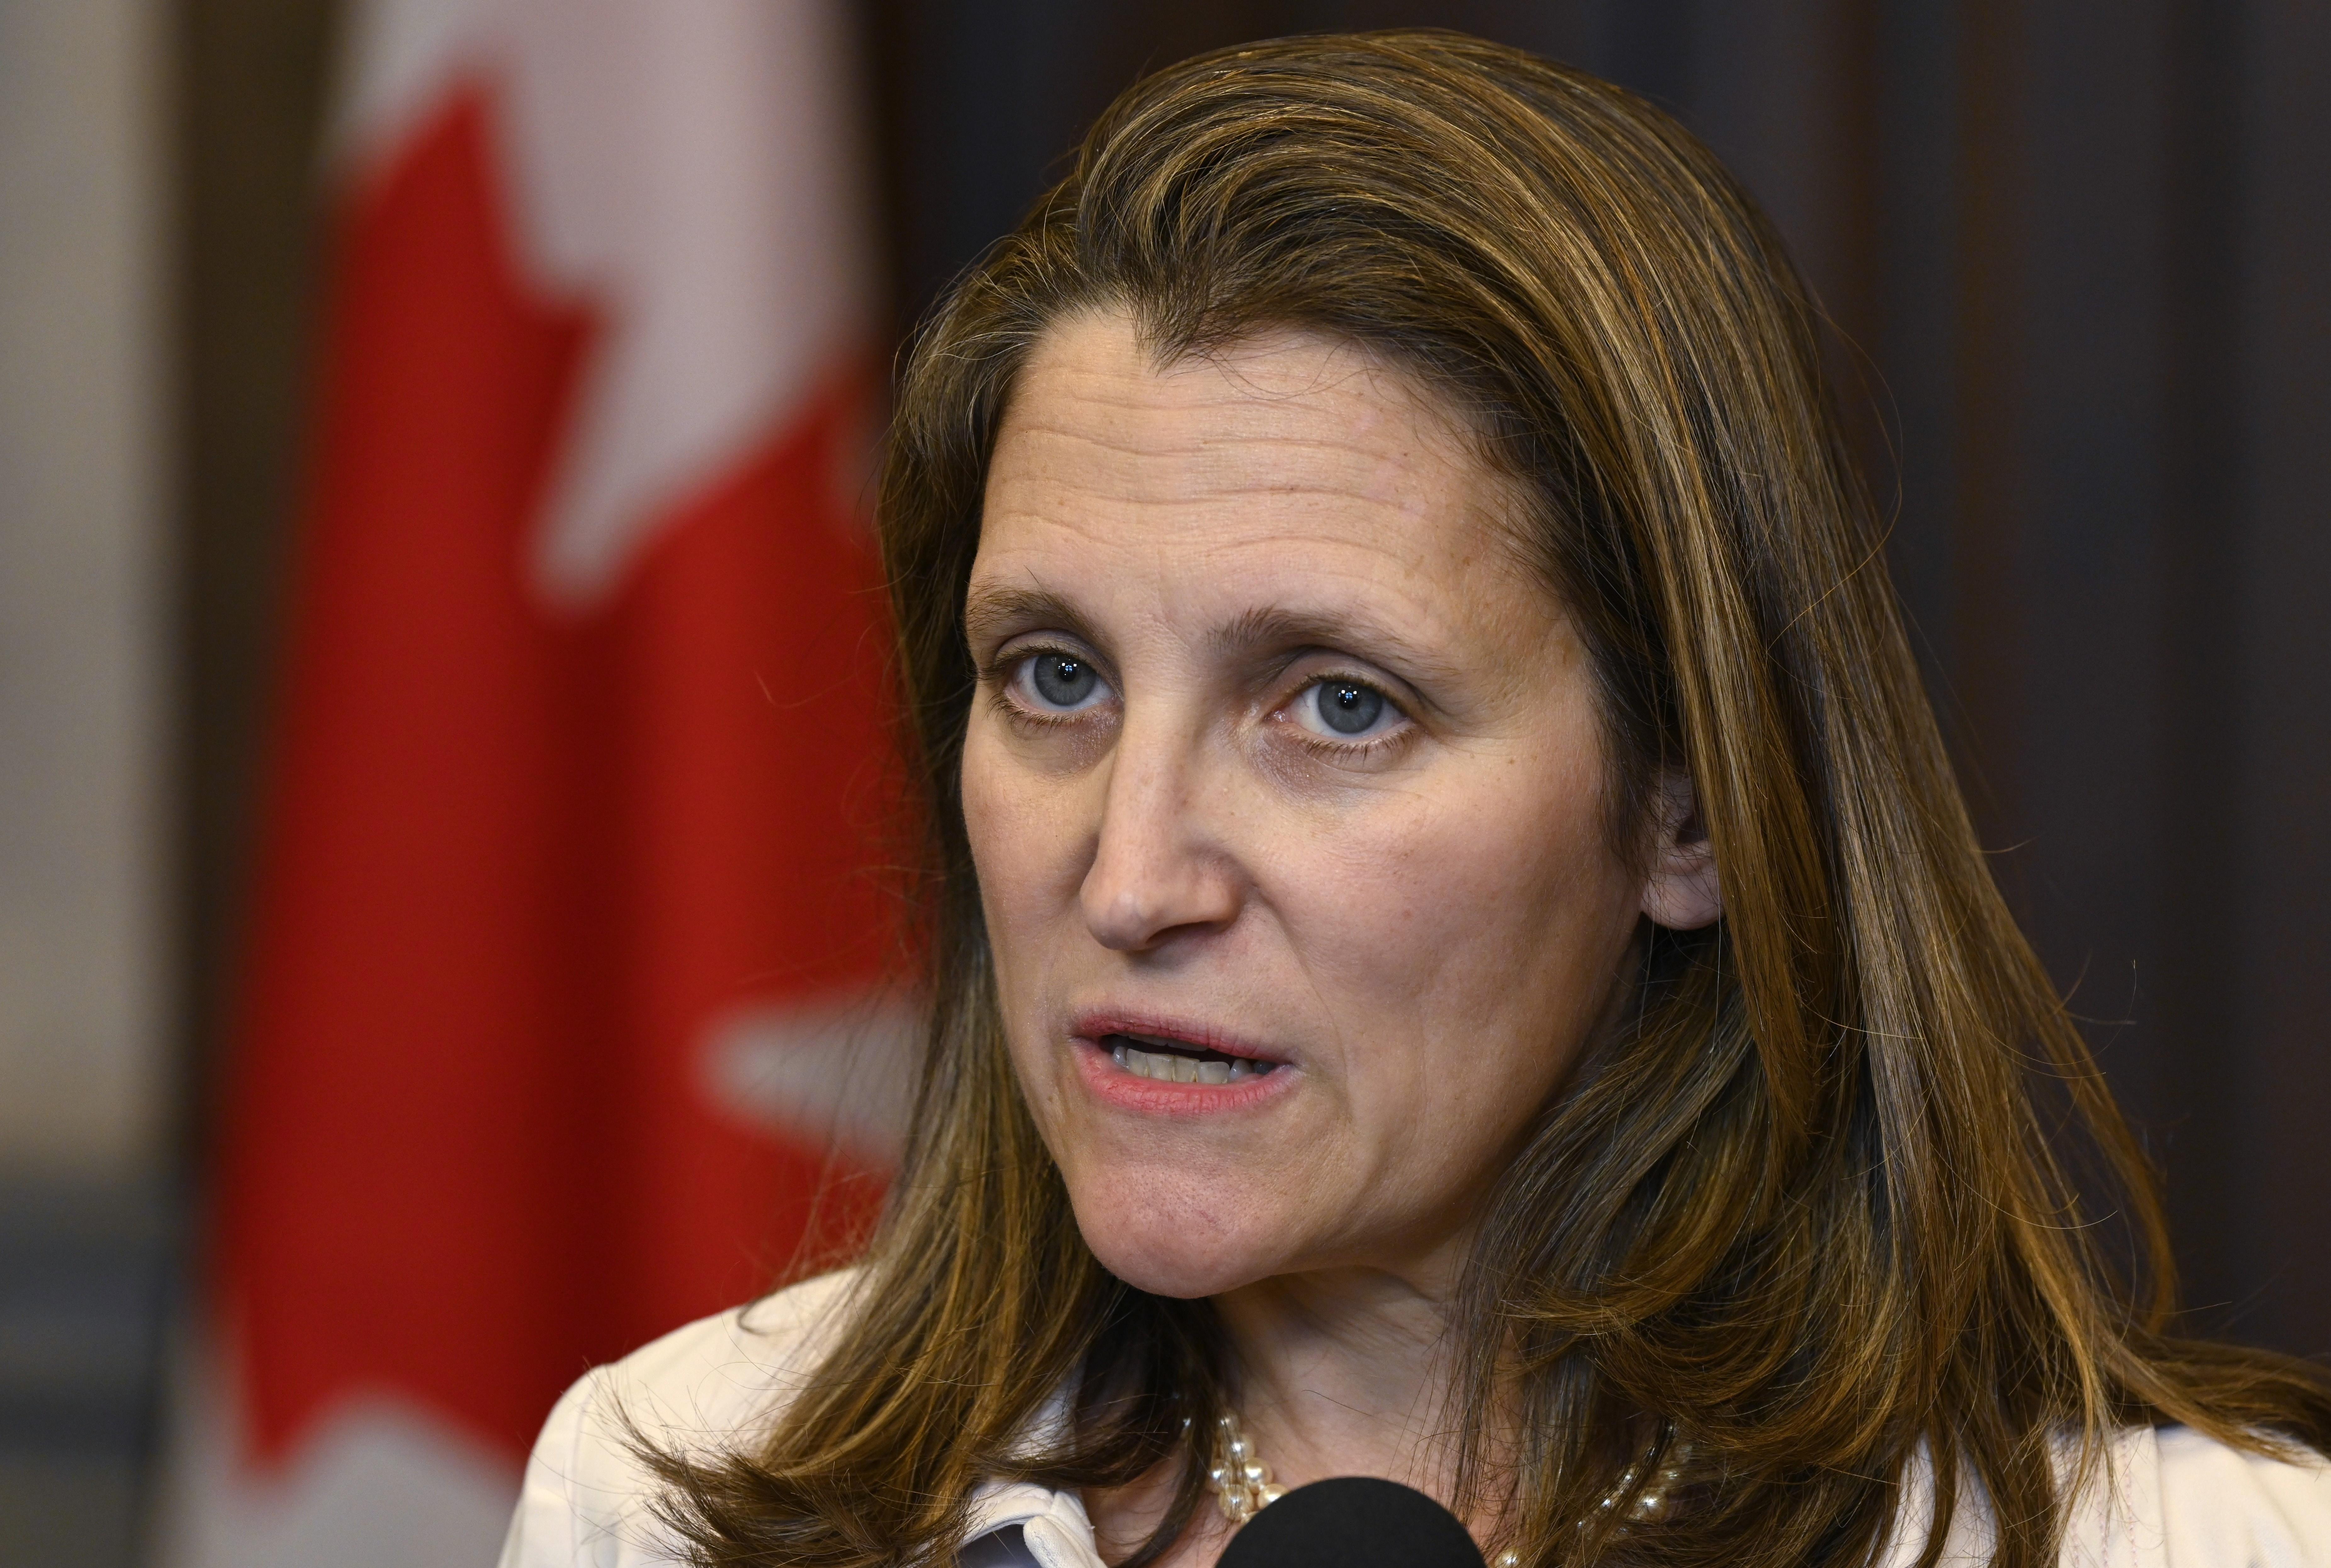 Canada Temporarily Suspends Operations at Embassy in Venezuela - FM